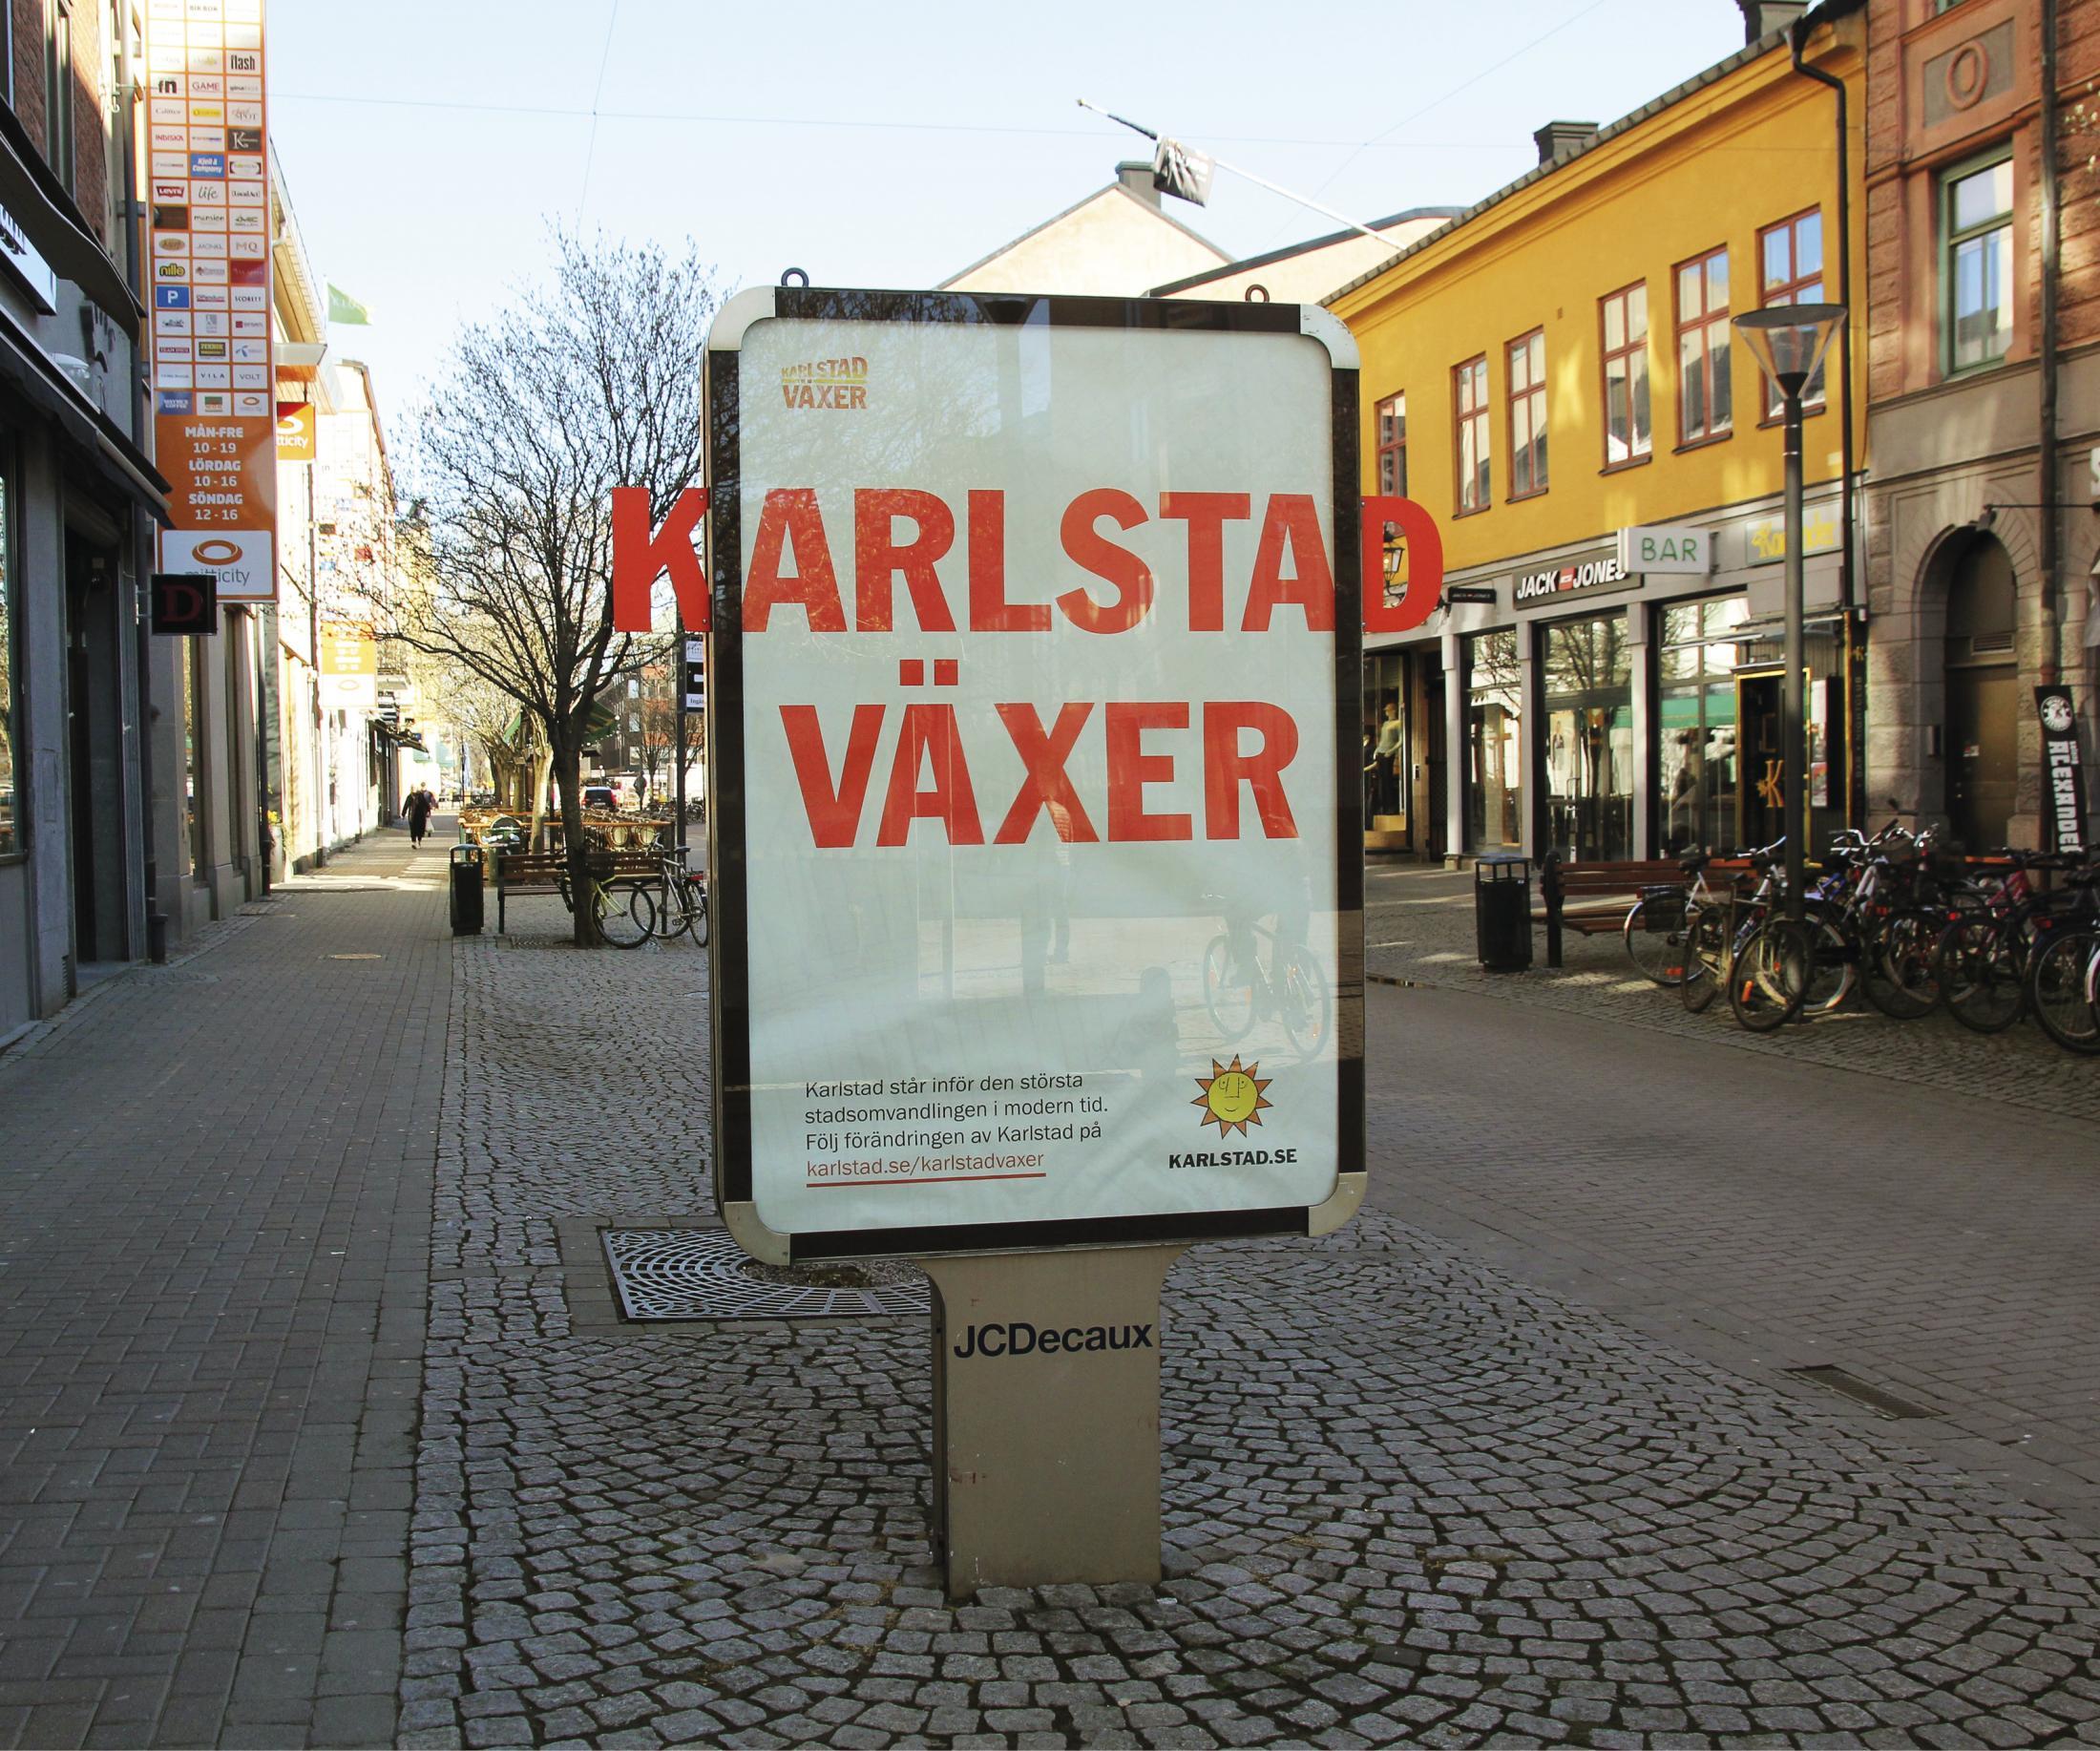 City Of Karlstad Outdoor Ad - City Of Karlstad Grows